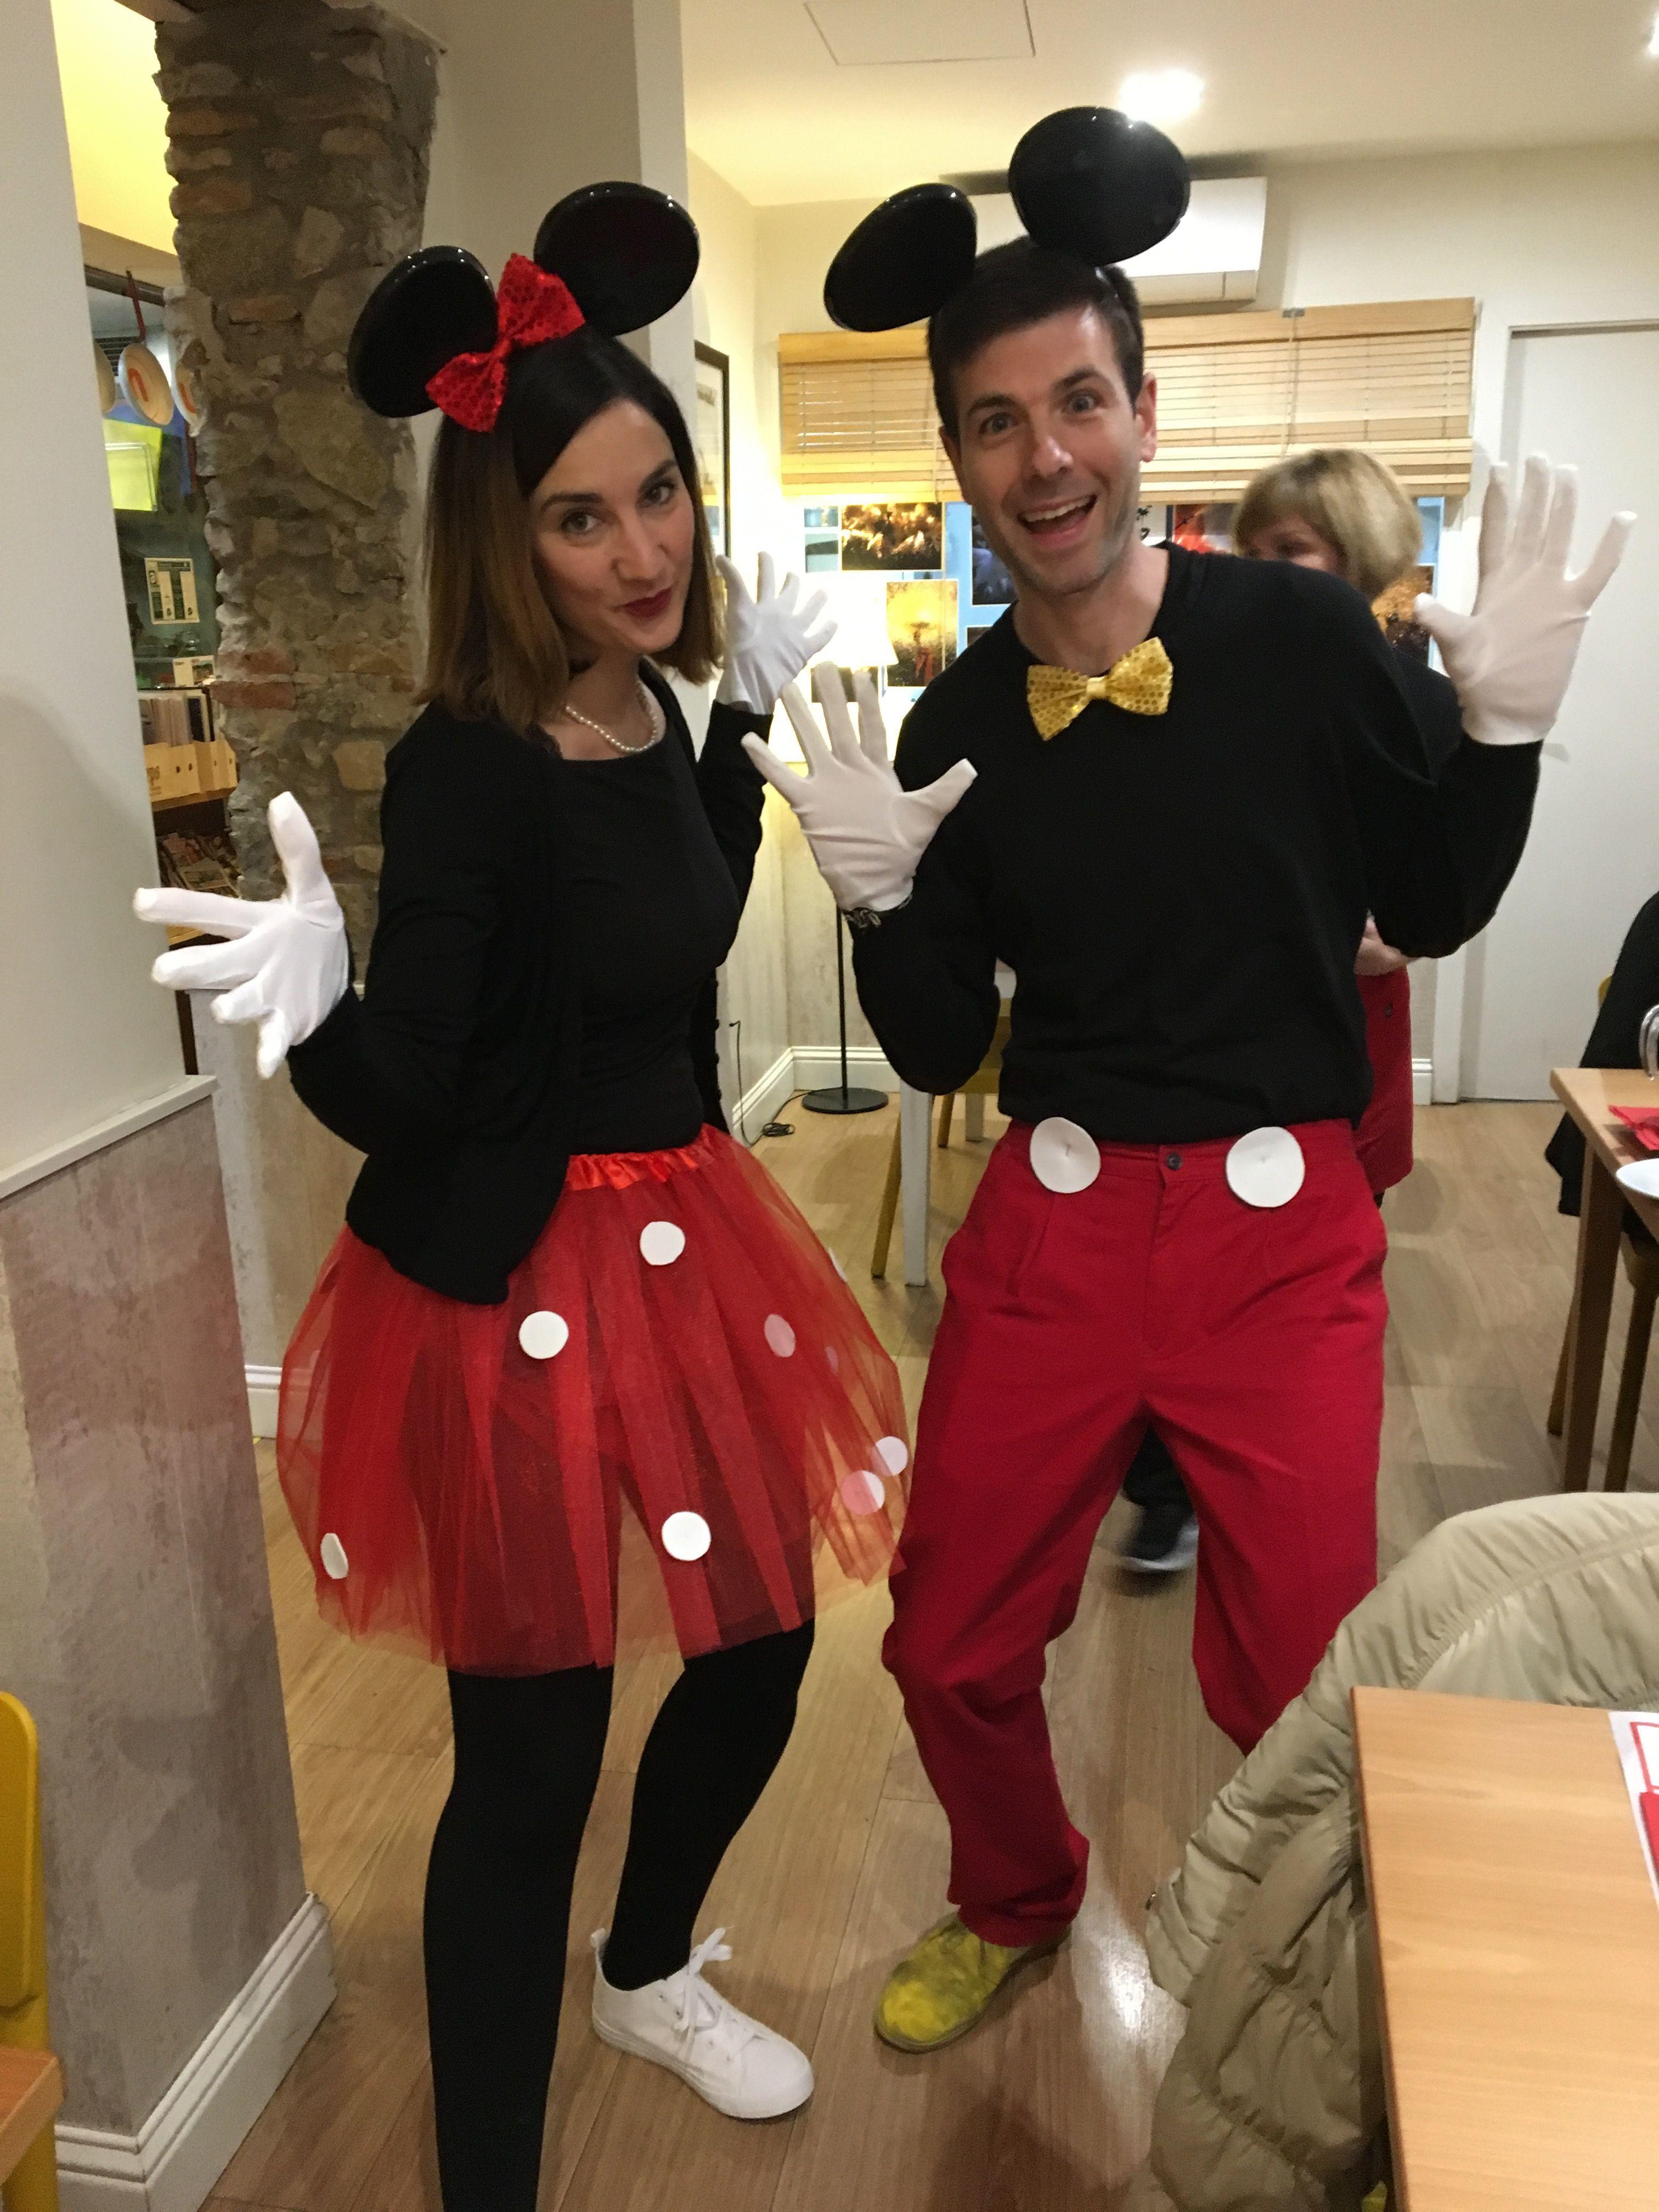 disfraz #pareja #disney #mickey #minnie #carnaval #costume #couple  #carnival #halloween #disneyc… | Traje de mickey, Traje de mickey mouse, Disfraz  mickey y minnie